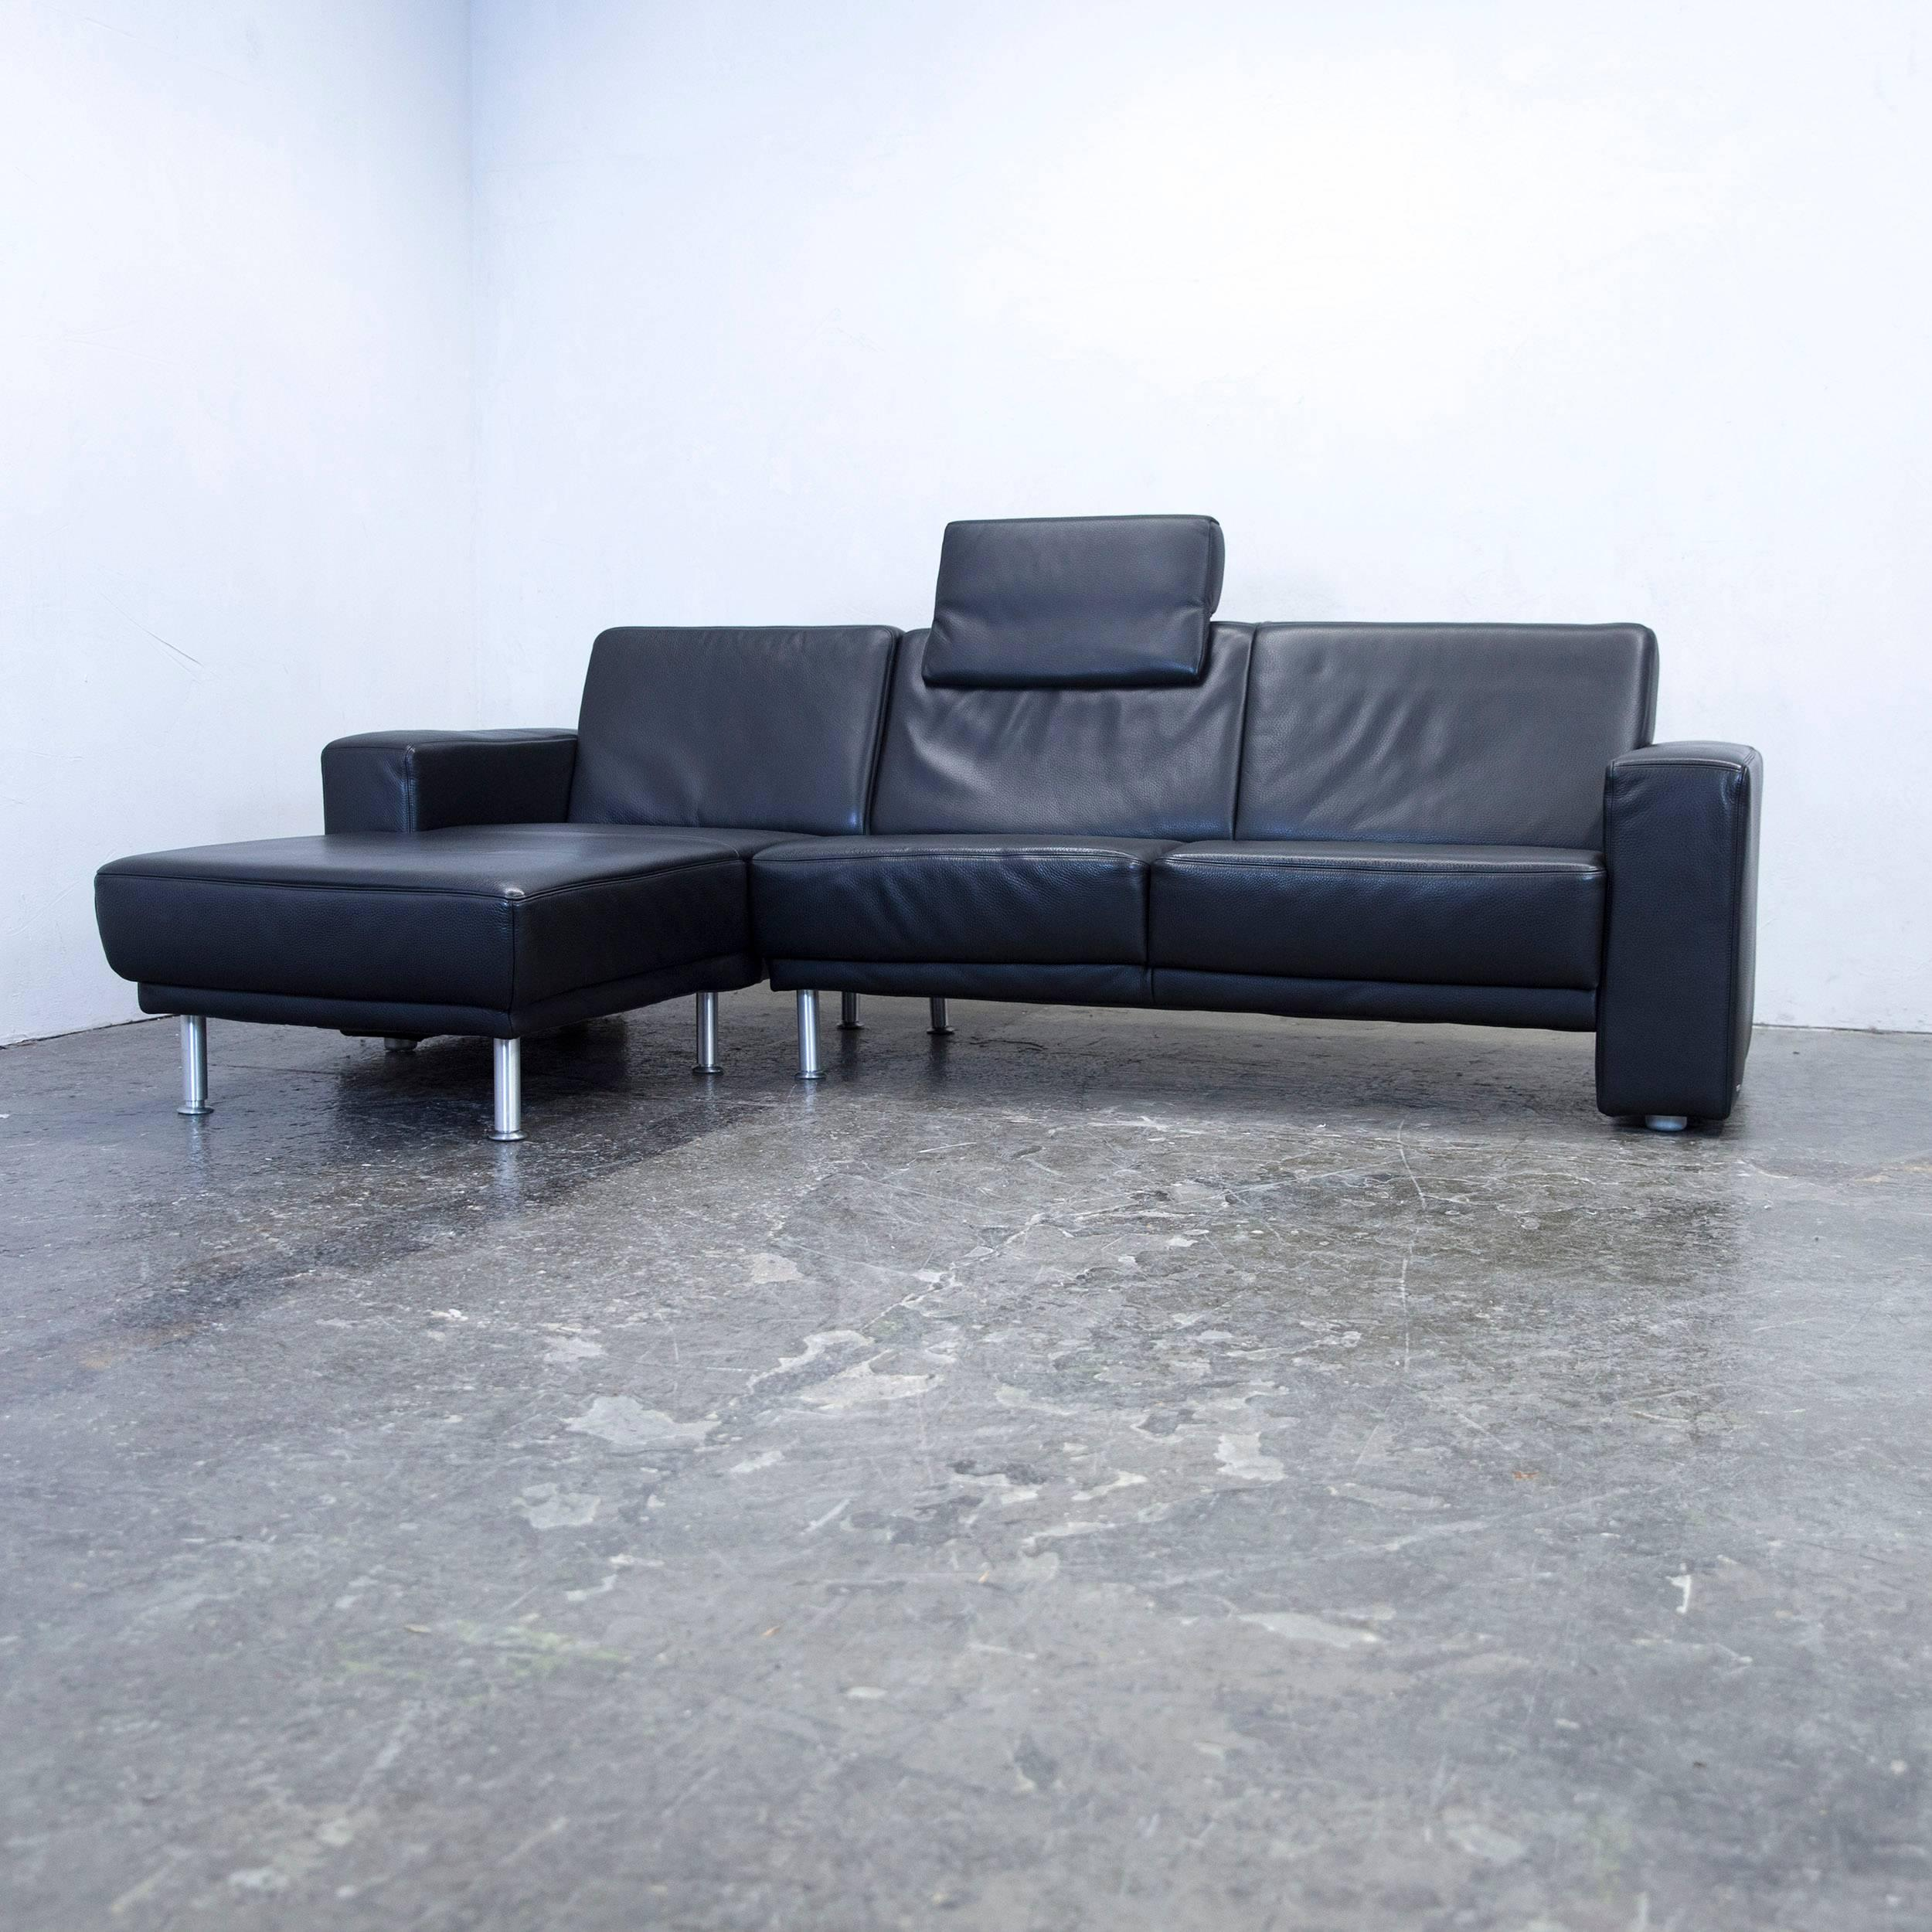 Koinor Designer Corner Sofa Set Leather Black Couch Modern 2